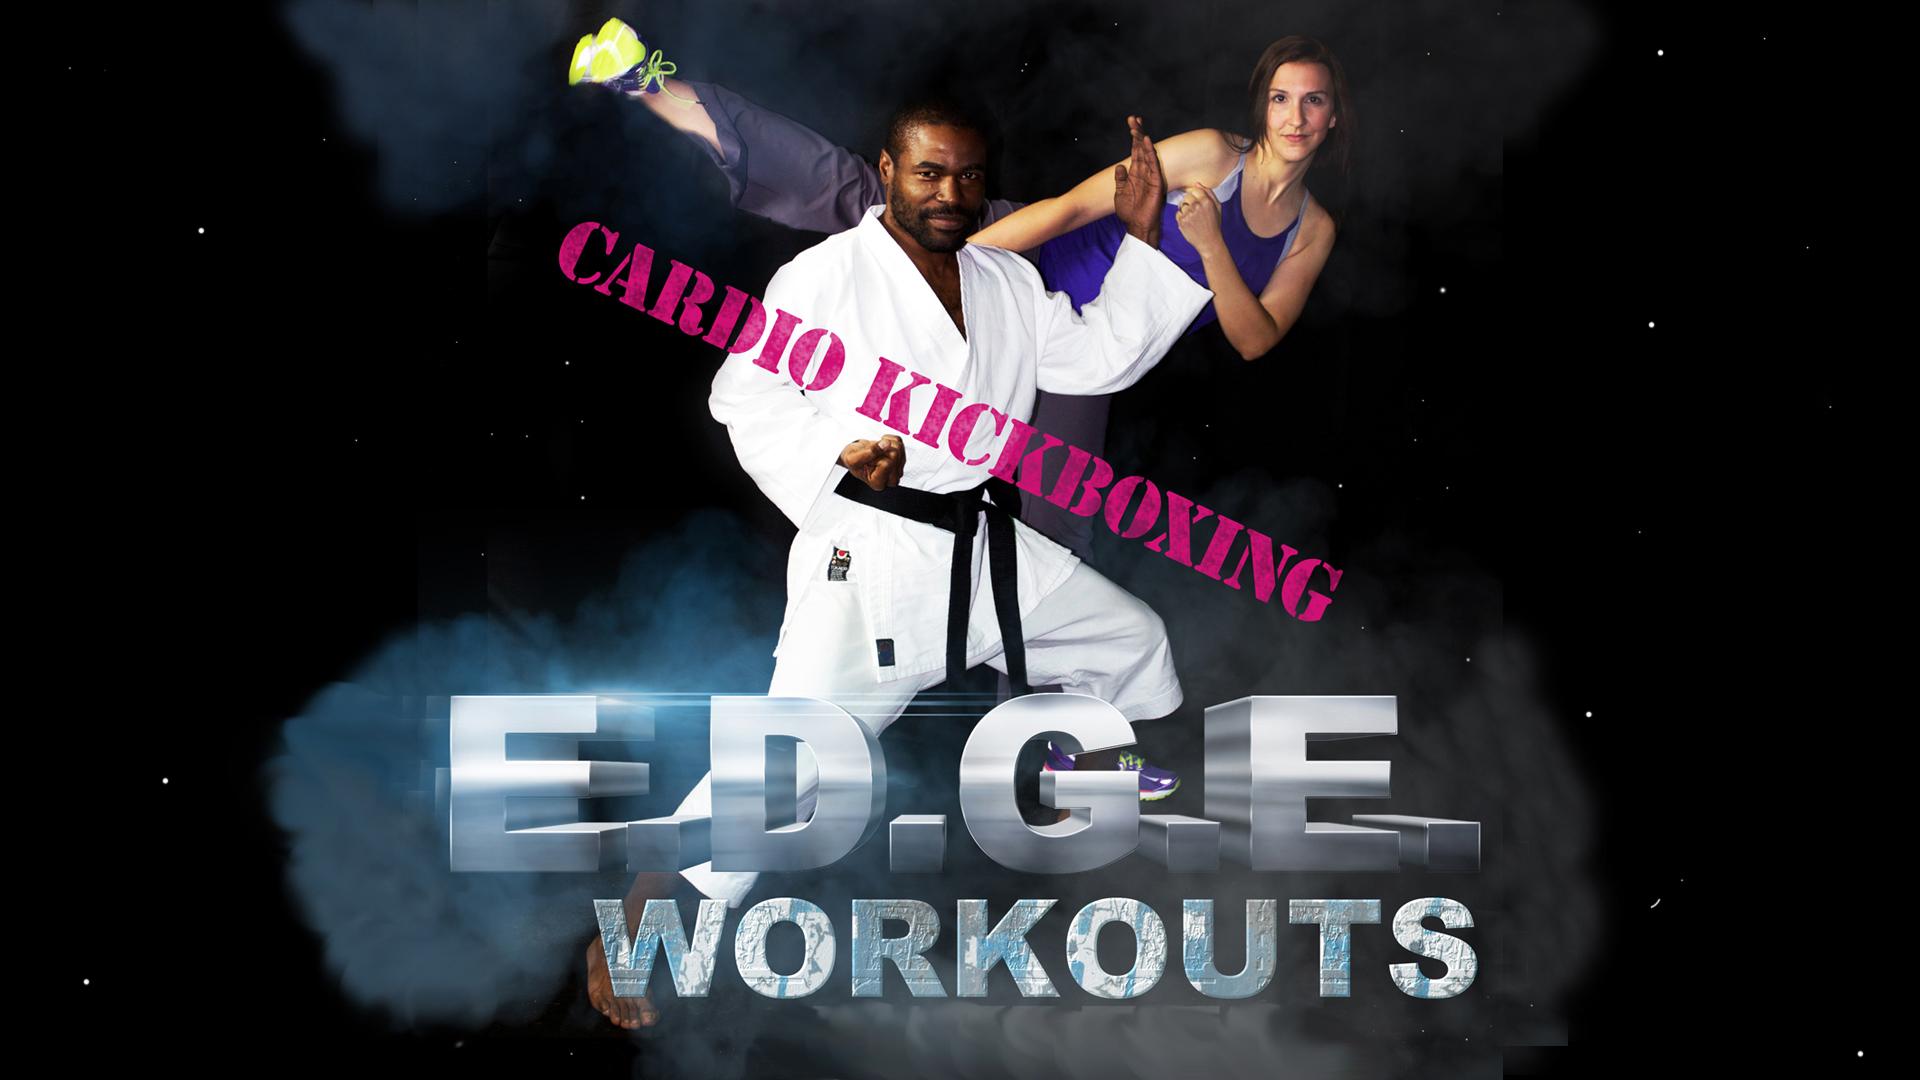 Watch Edge Workouts Shotokan Karate Prime Video